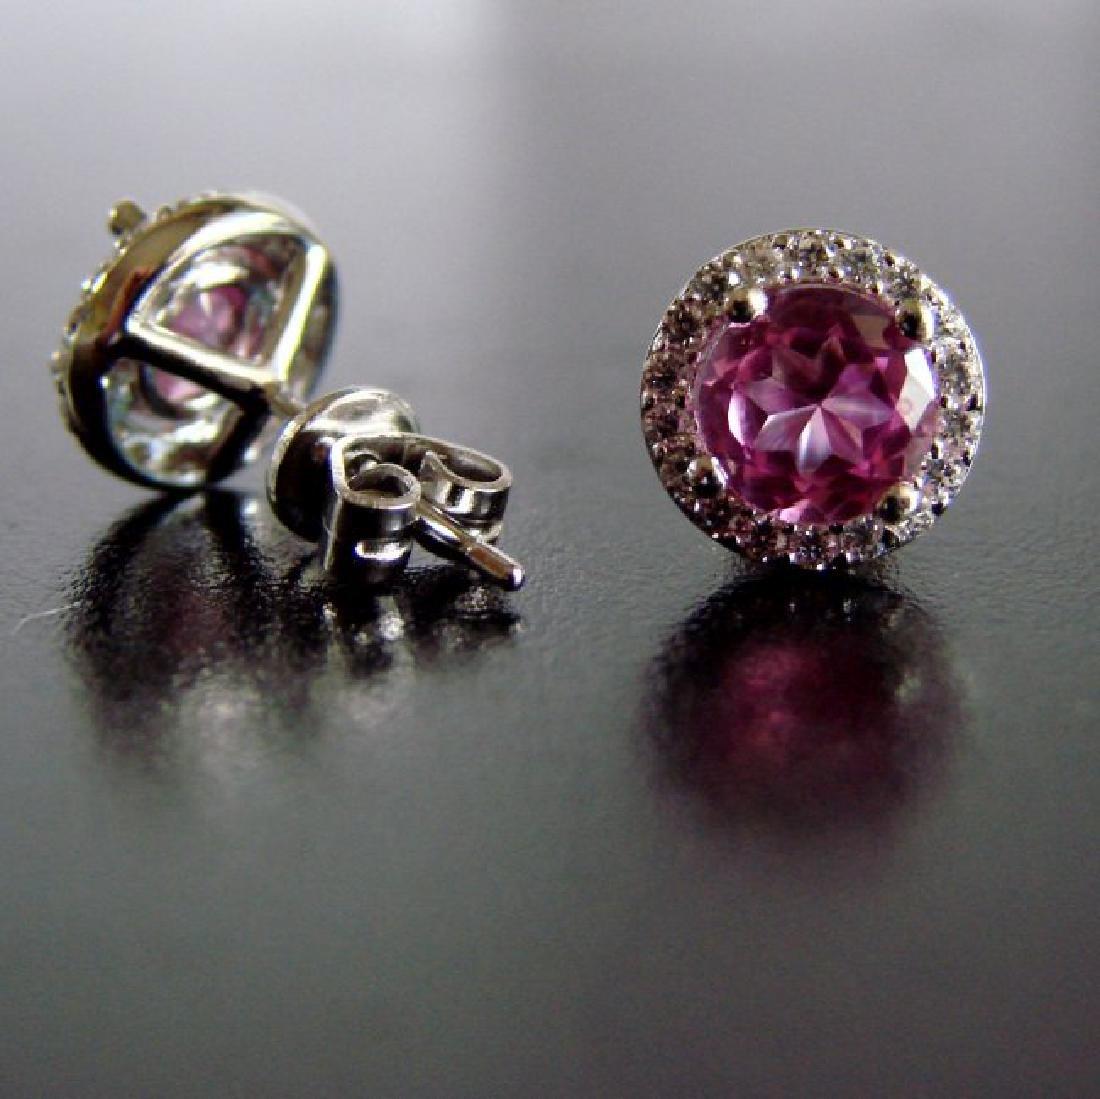 Creation Diamond & Pink Topaz Earrings 2.36Ct 18k W/g - 2